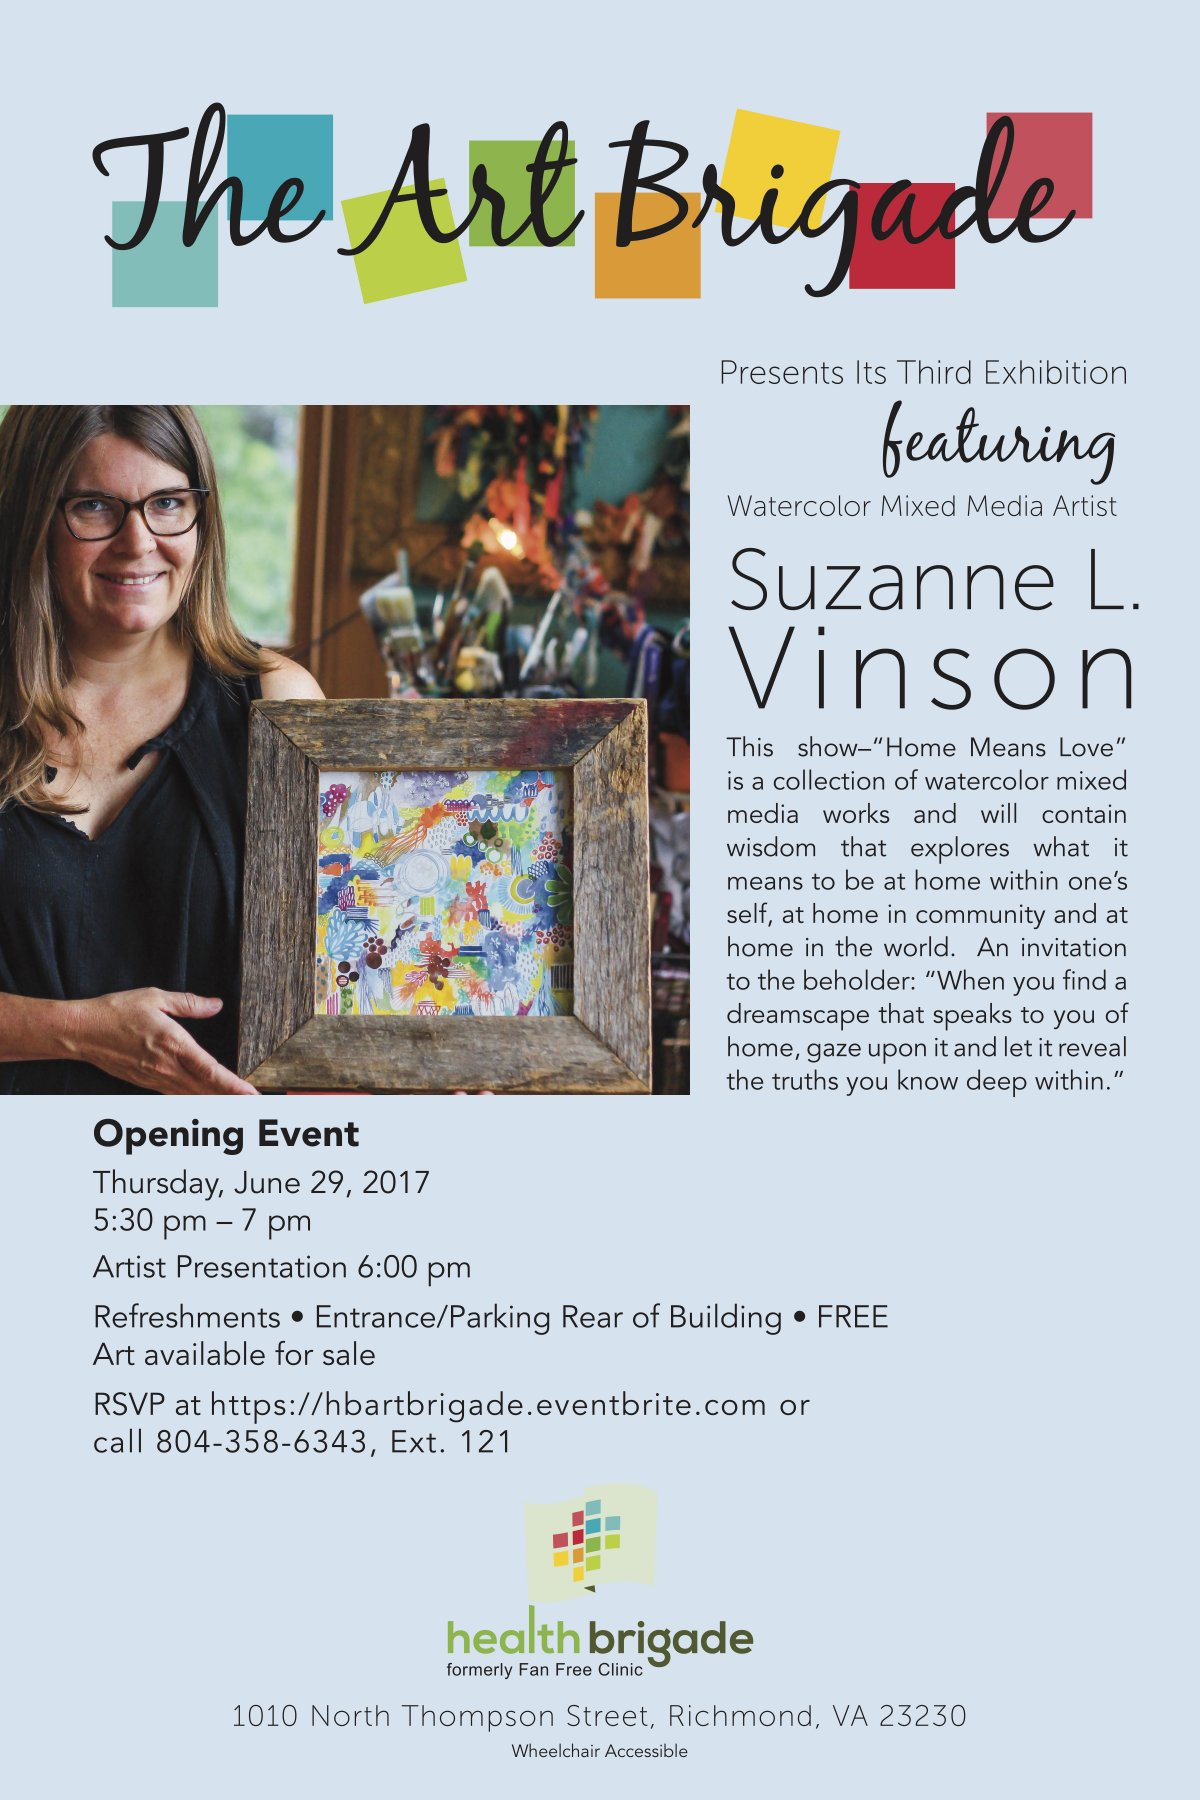 SuzanneVinson_poster_resized.jpg